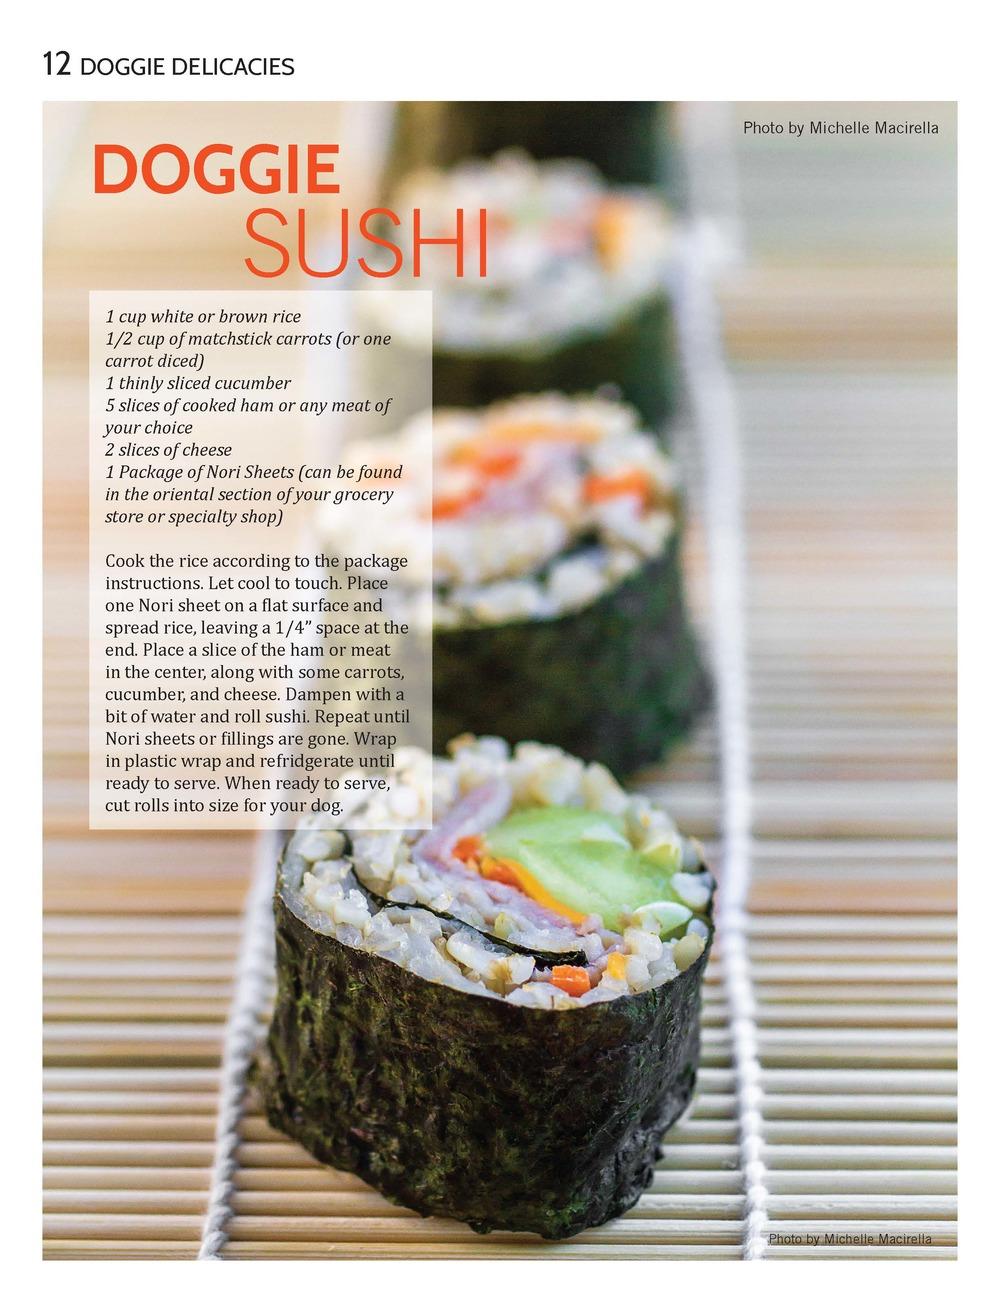 Doggie SushiPC.jpg